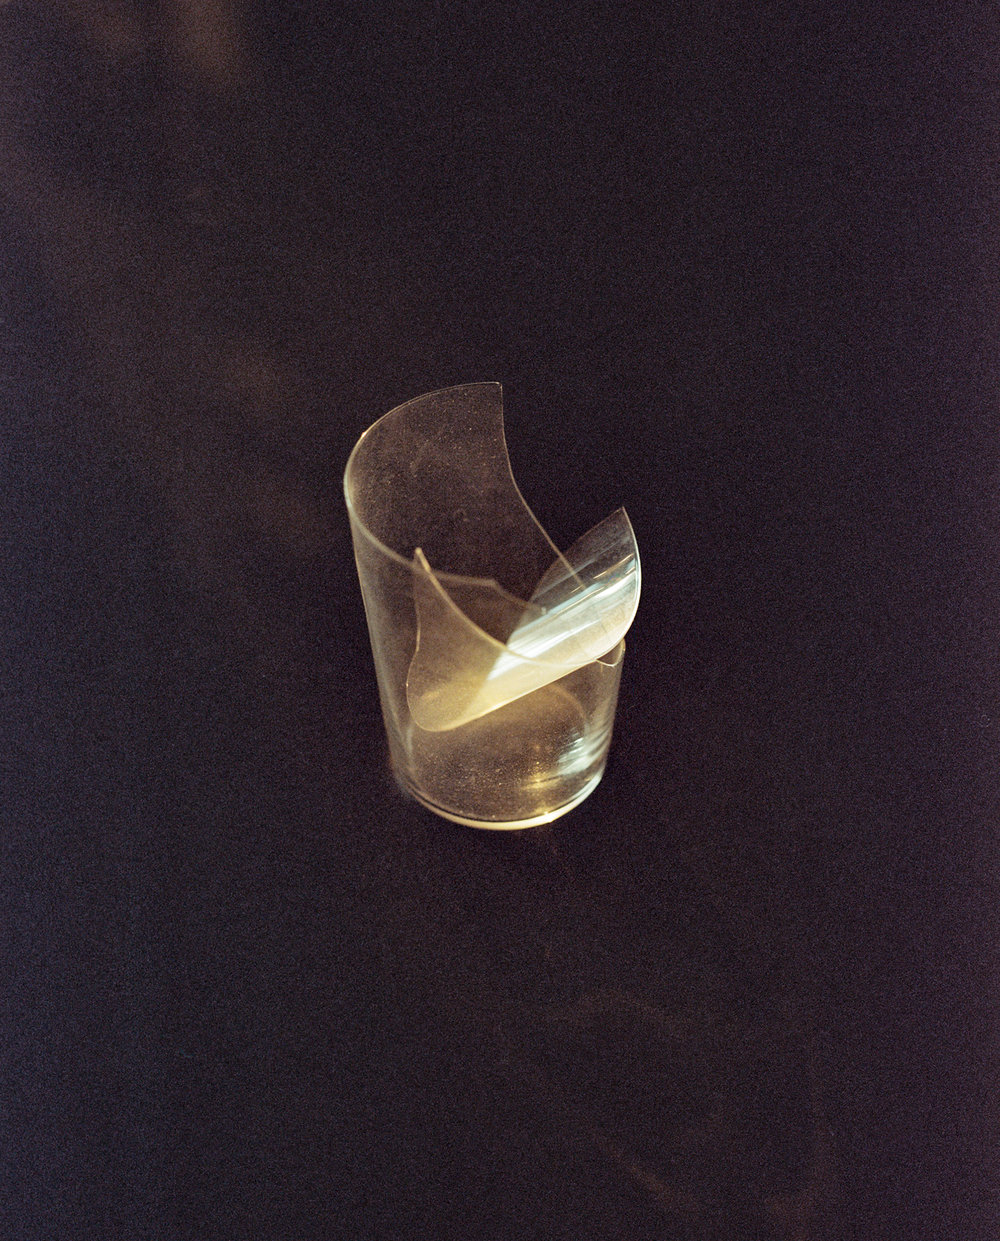 Broken Glass #58